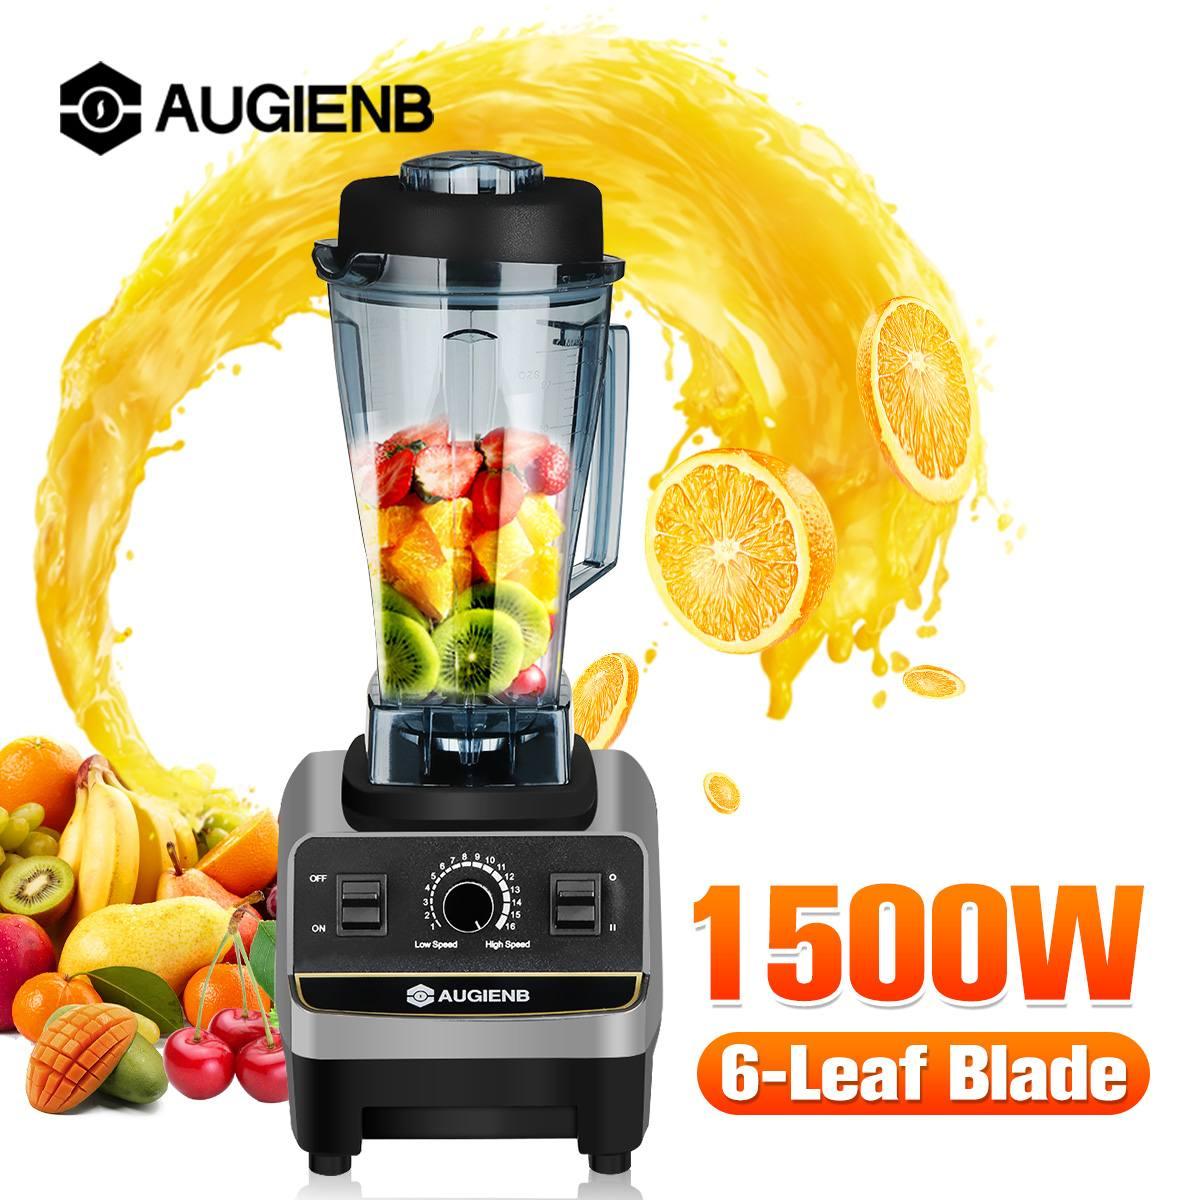 1500W Heavy Duty Commercial Grade Blender Mixer Juicer High Power Food Processor Ice Smoothie Bar Fruit Blender